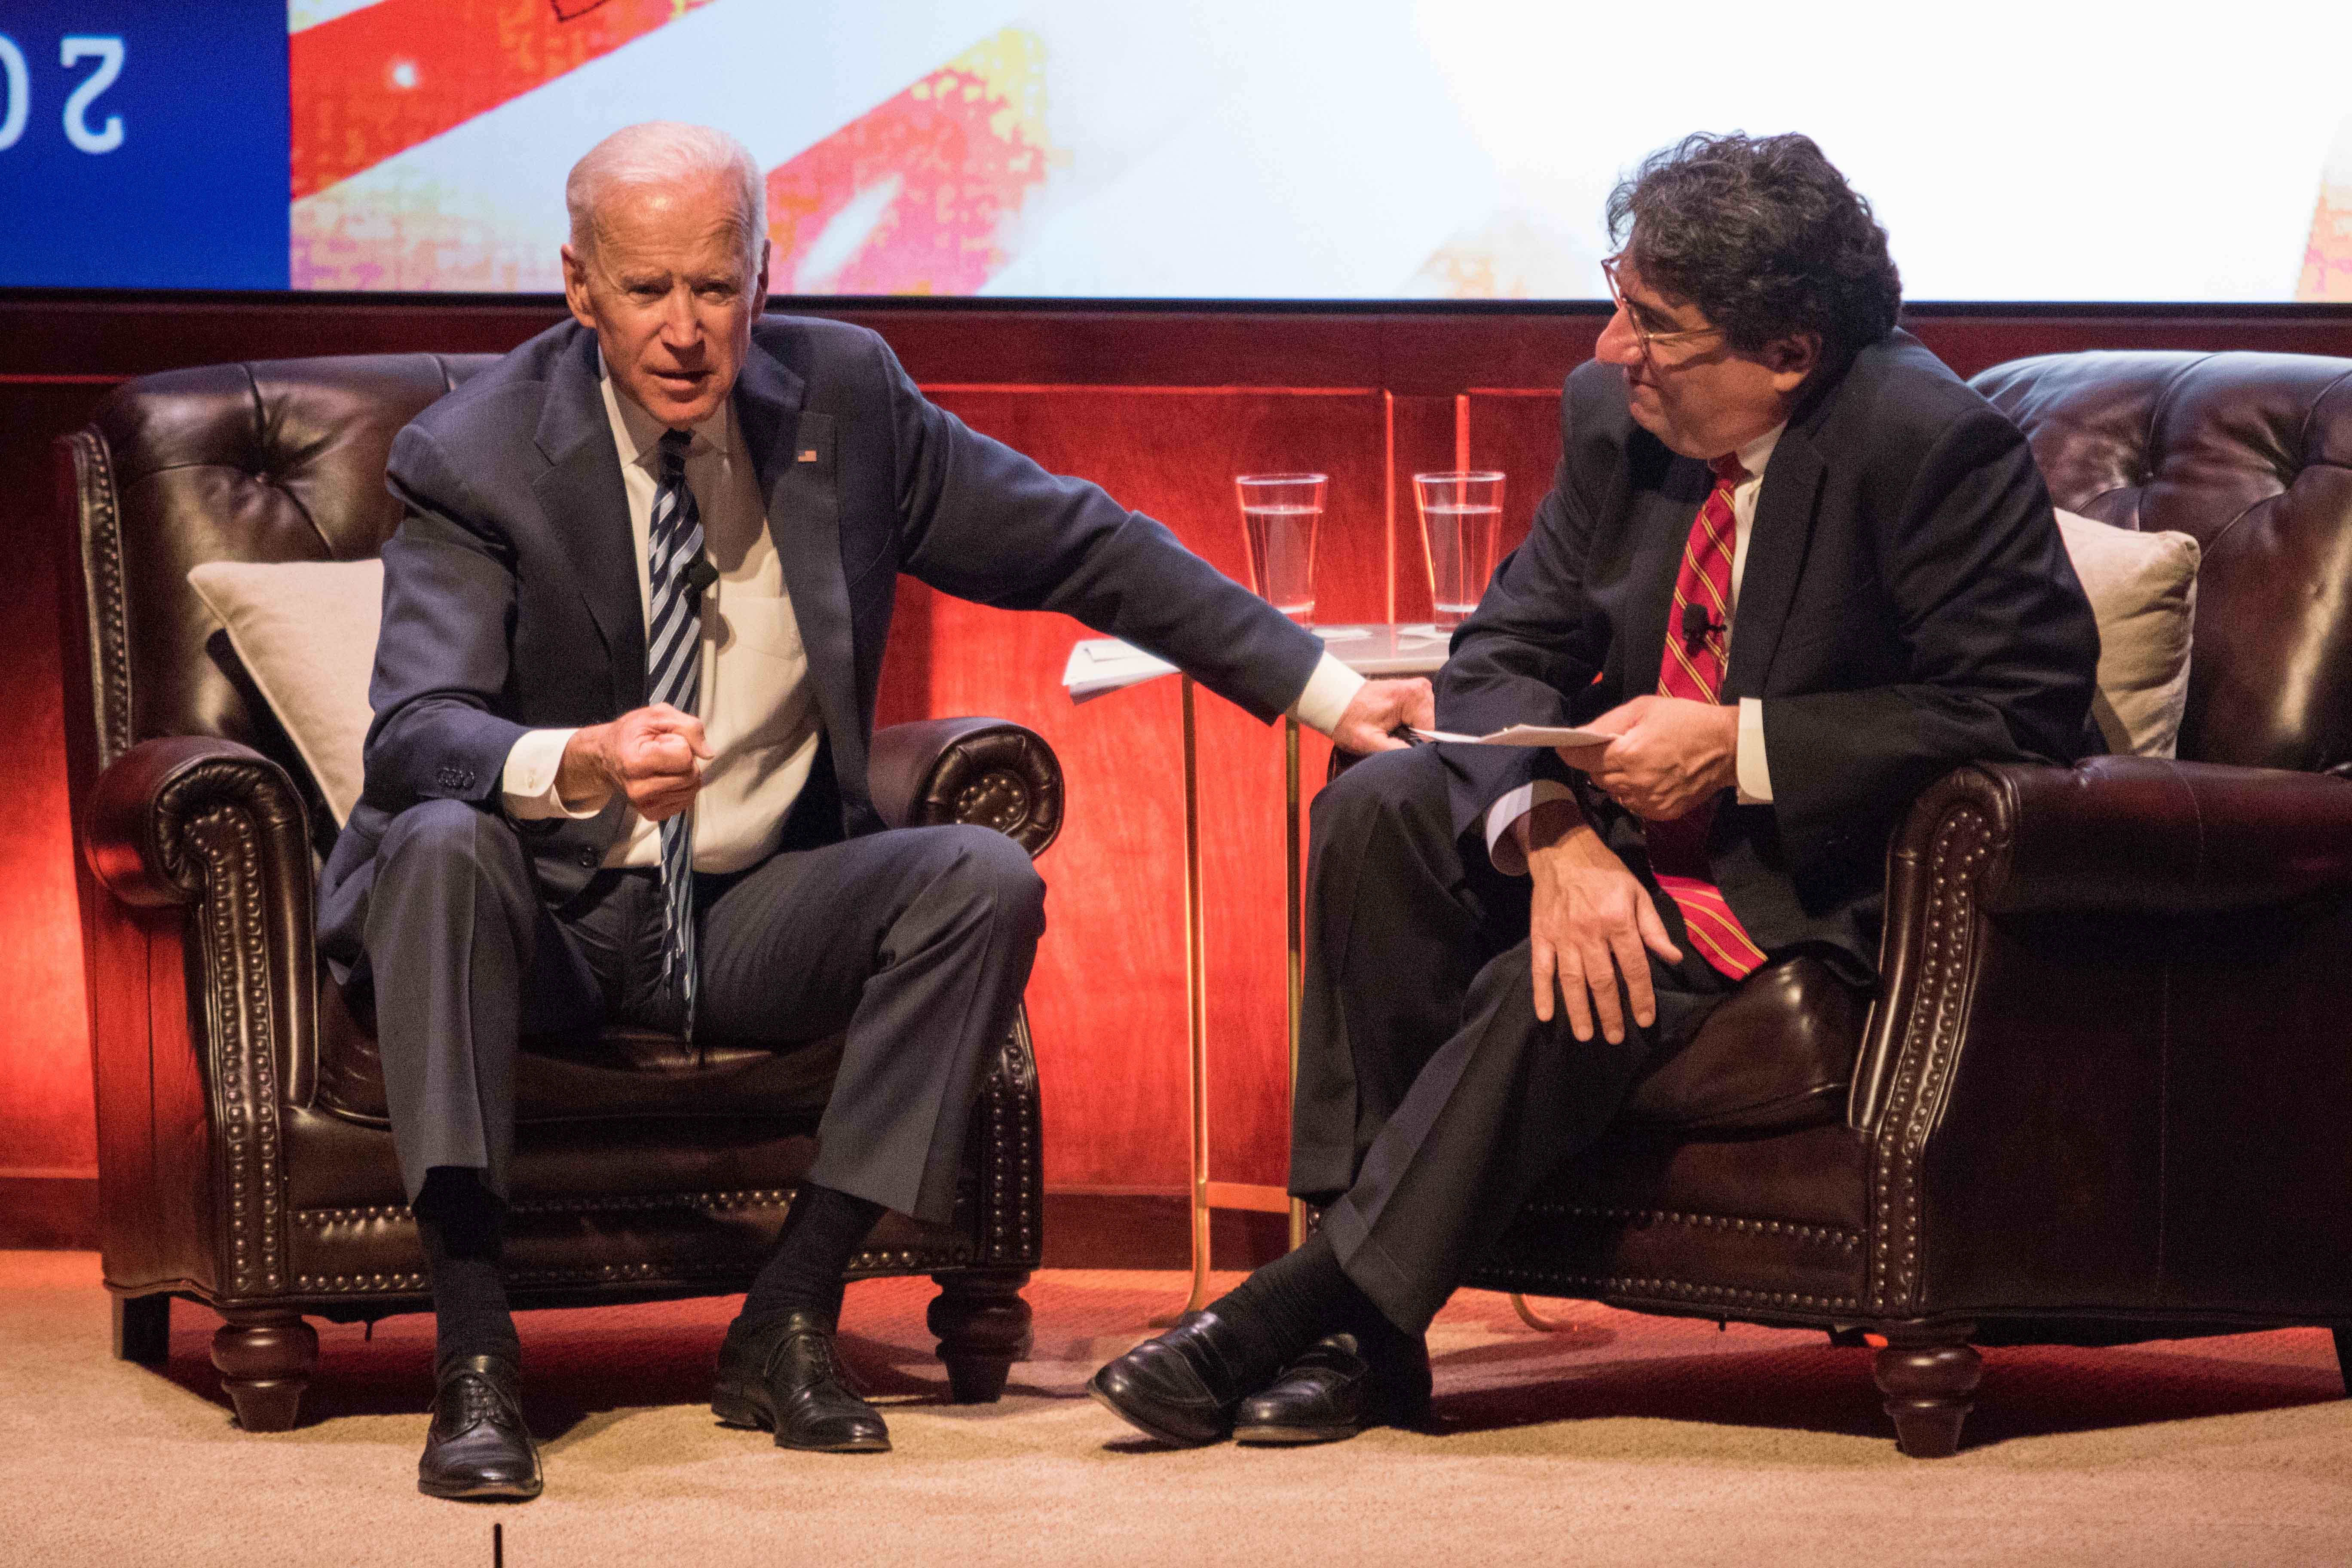 Joe Biden speaks at Vanderbilt April 10, 2018.